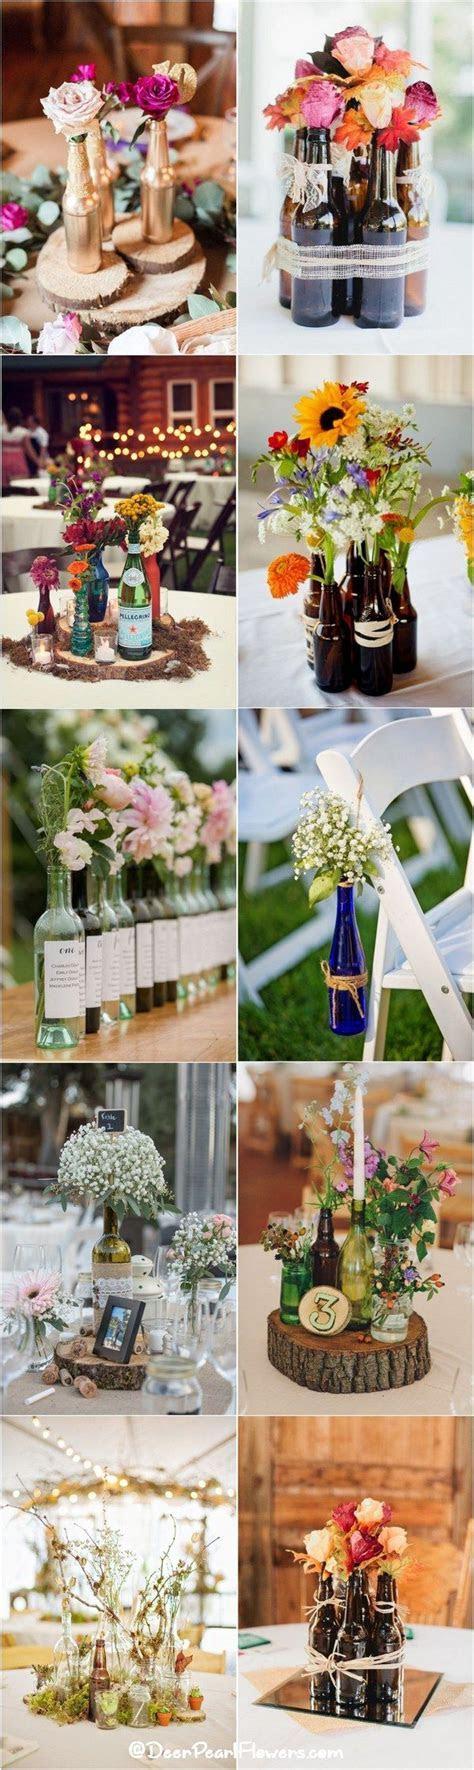 1000  ideas about Vineyard Wedding Themes on Pinterest